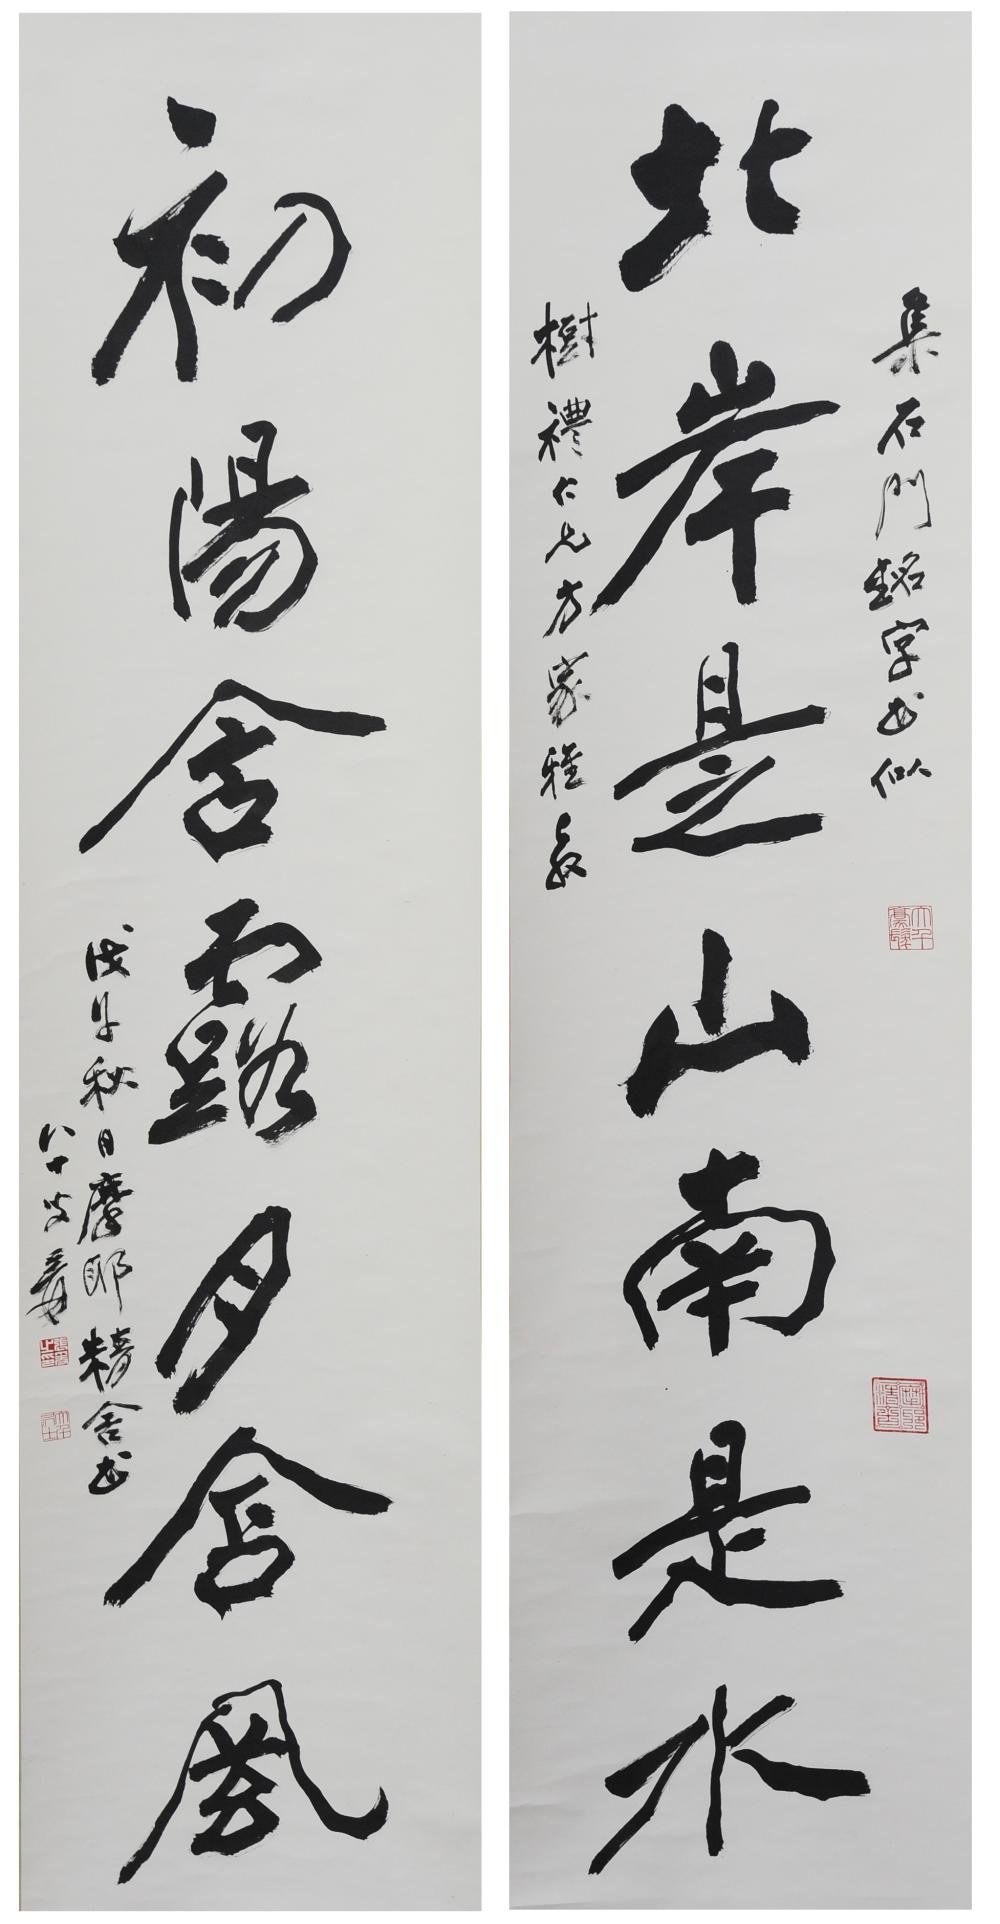 7-CHARACTER CALLIGRAPHY COUPLET, ZHANG DAQIAN